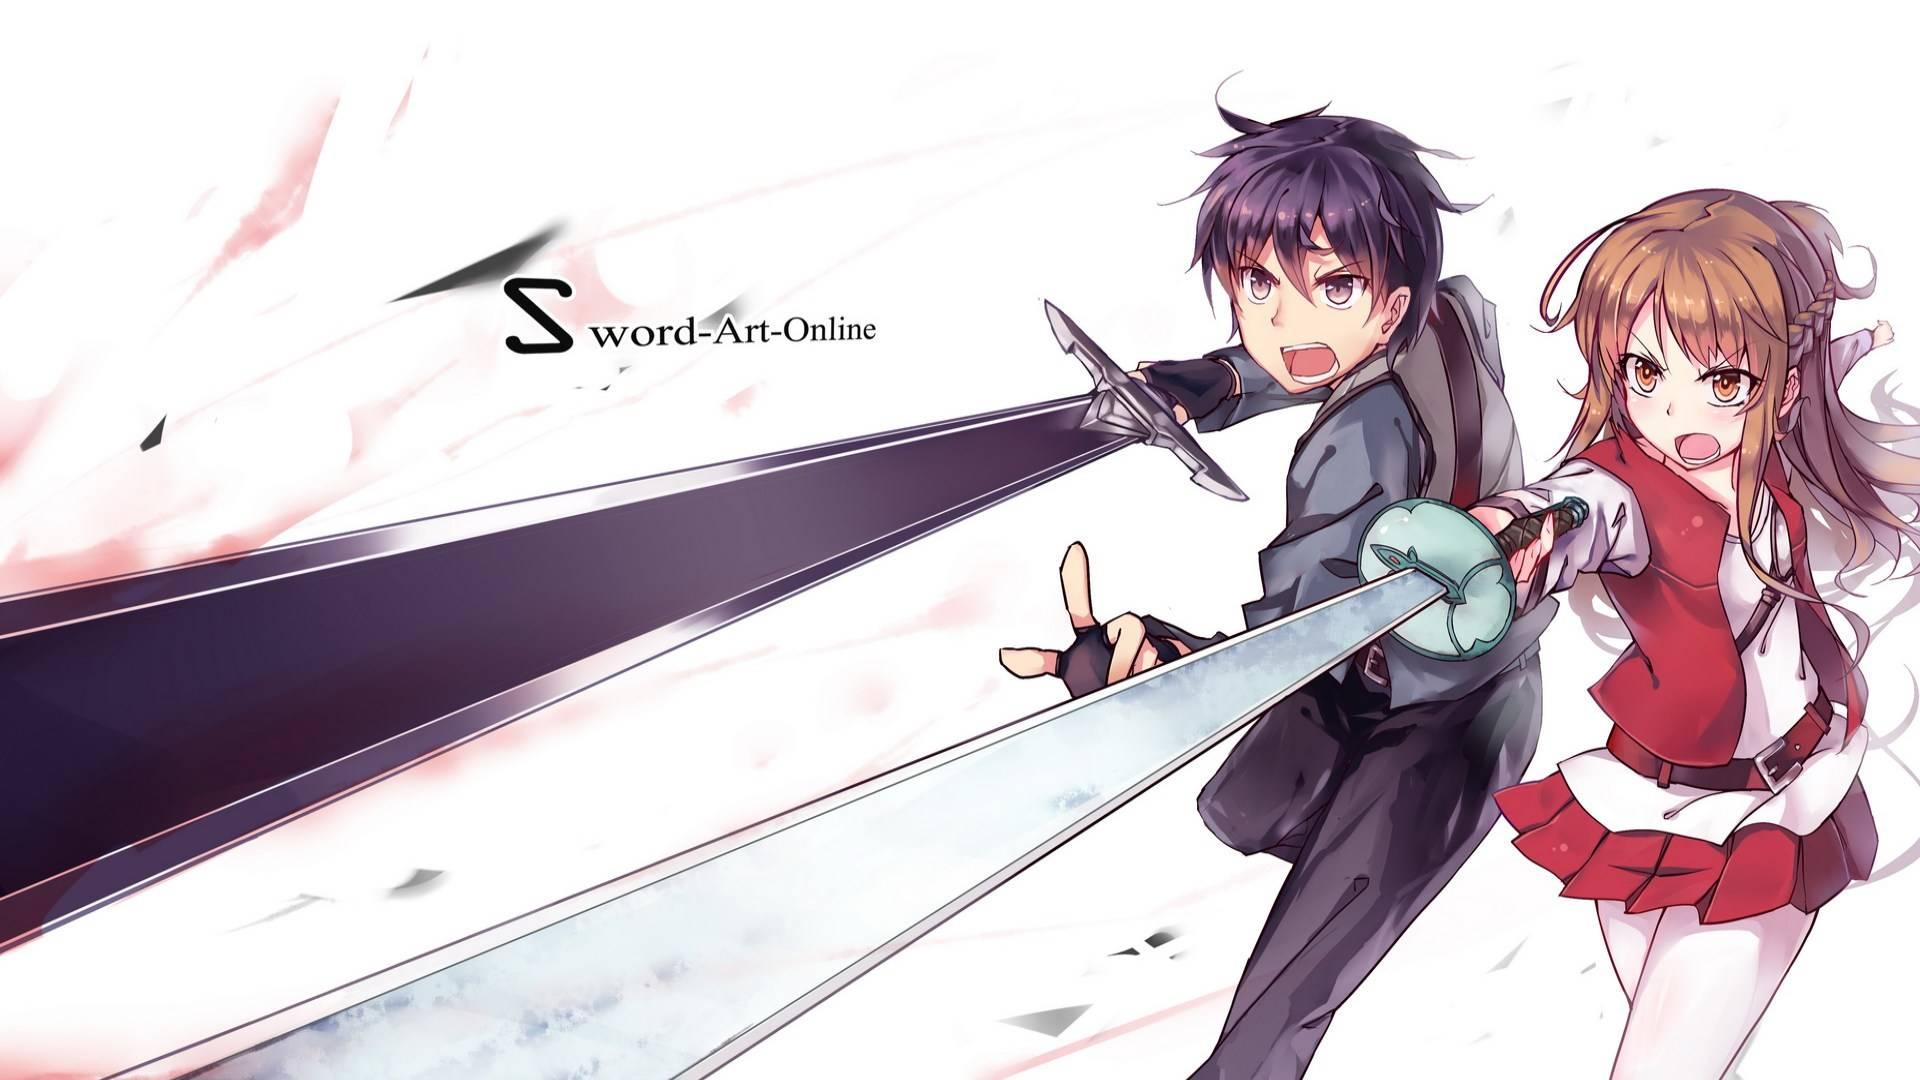 Kirito and Asuna   Sword Art Online Wallpaper 1920x1080